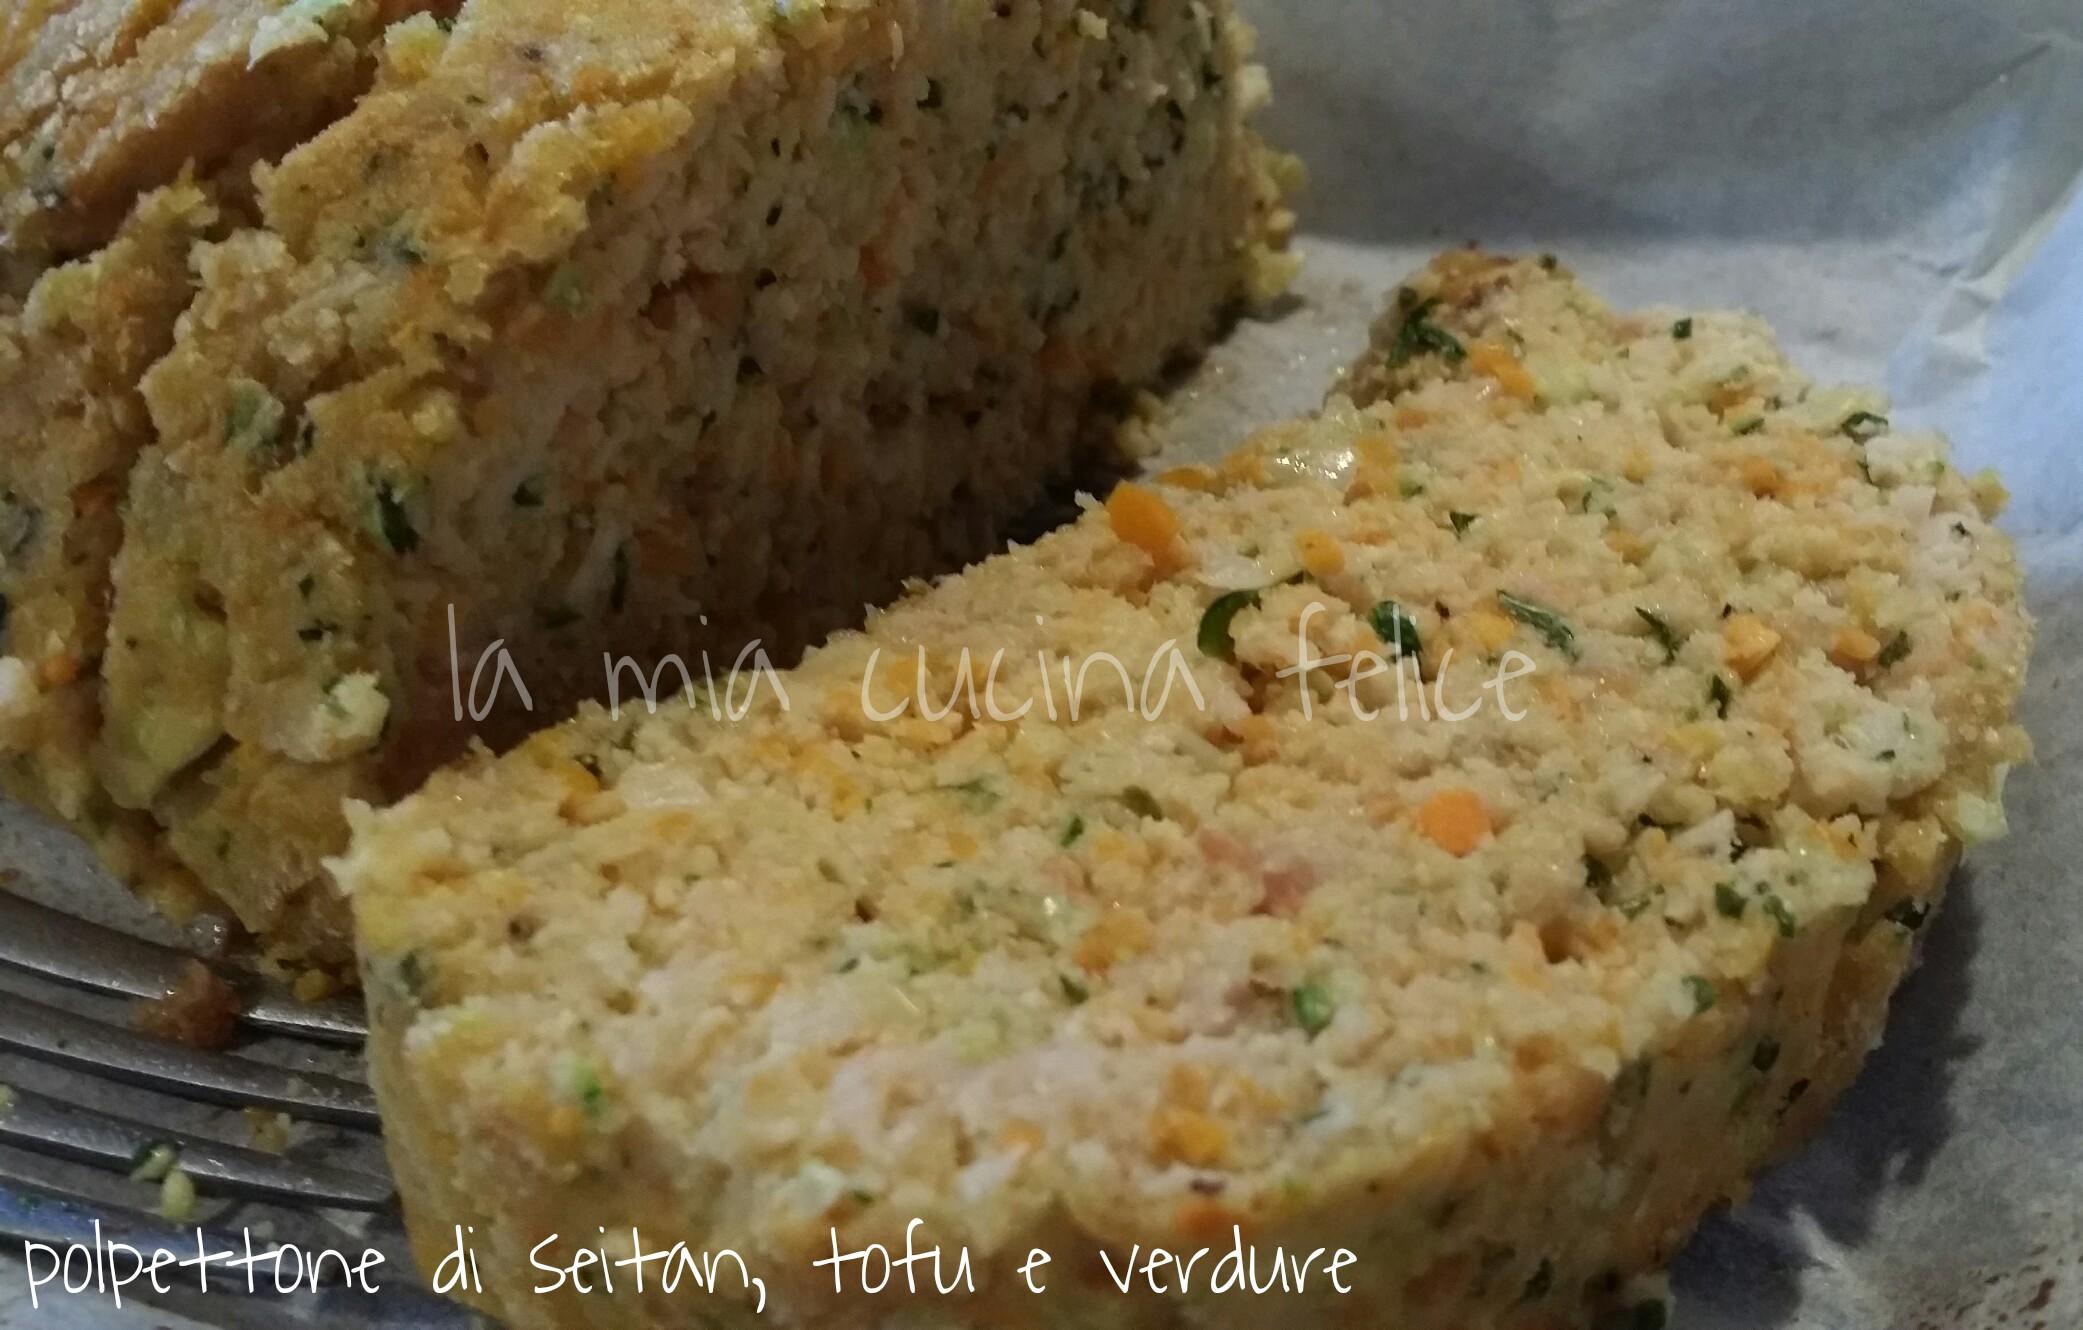 Polpettone di seitan, tofu e verdure